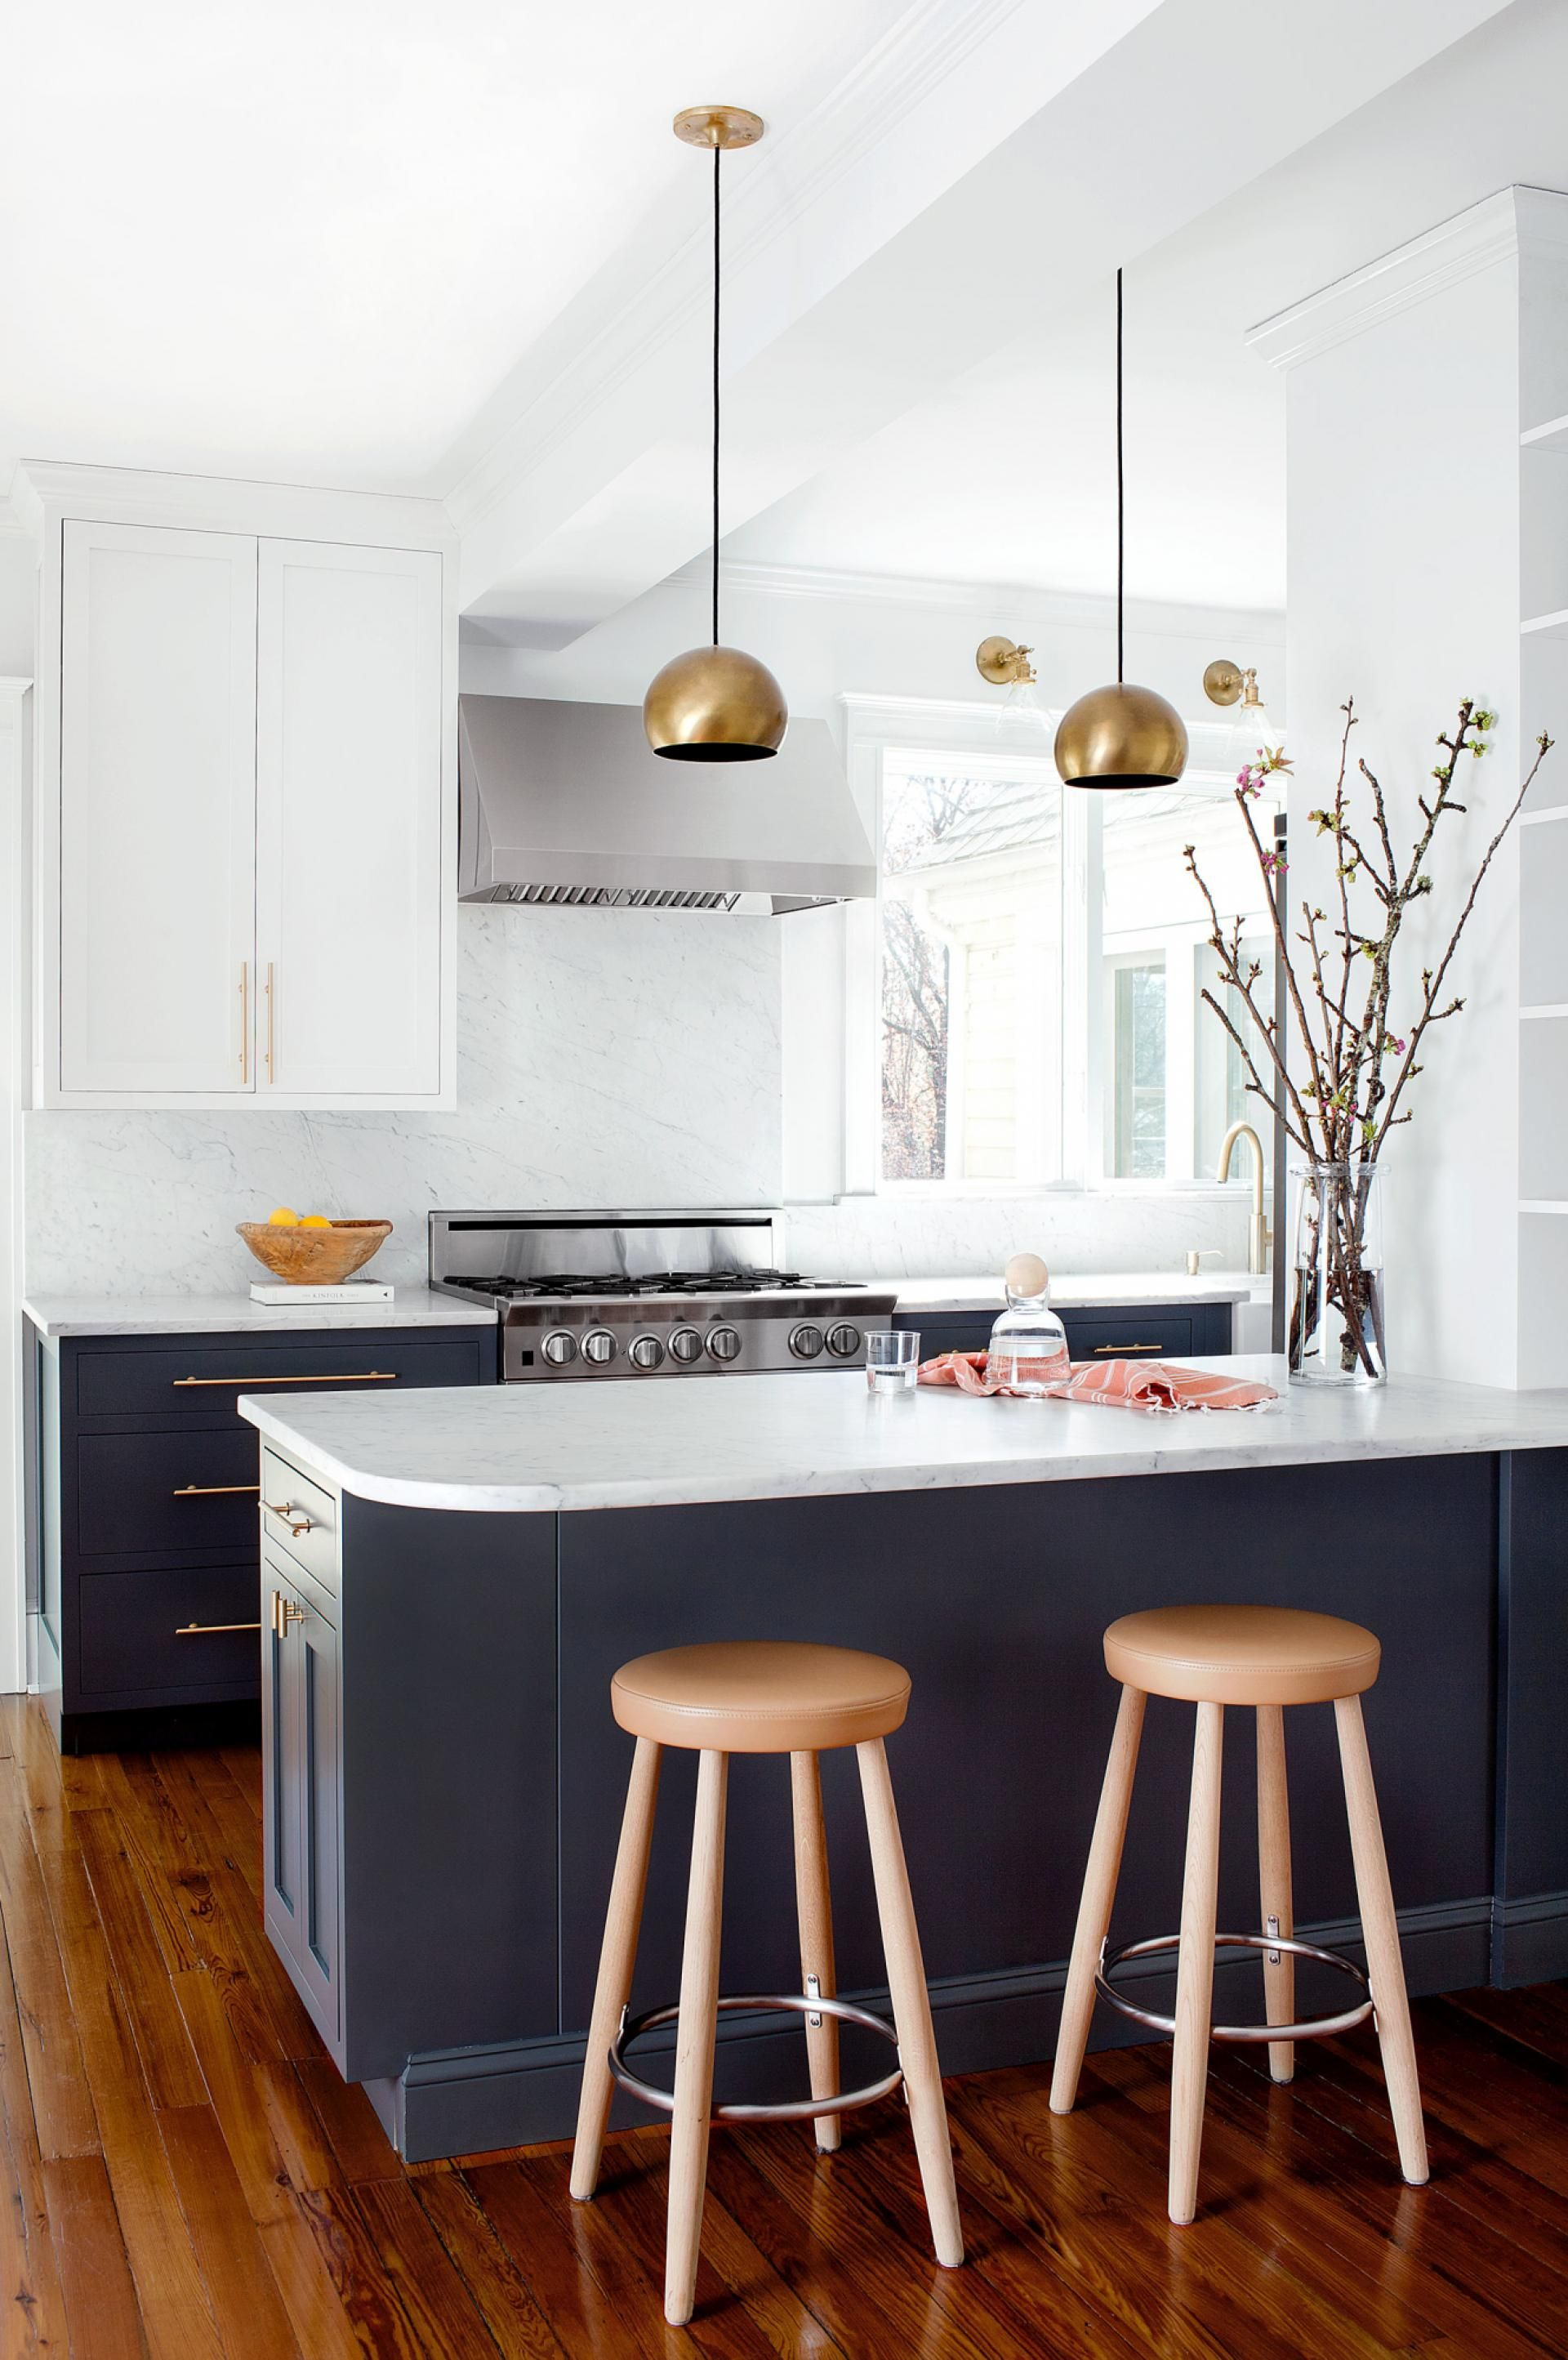 bench-kitchen-lawson-hord-hughes-1-use | CASA | Pinterest | Bench ...